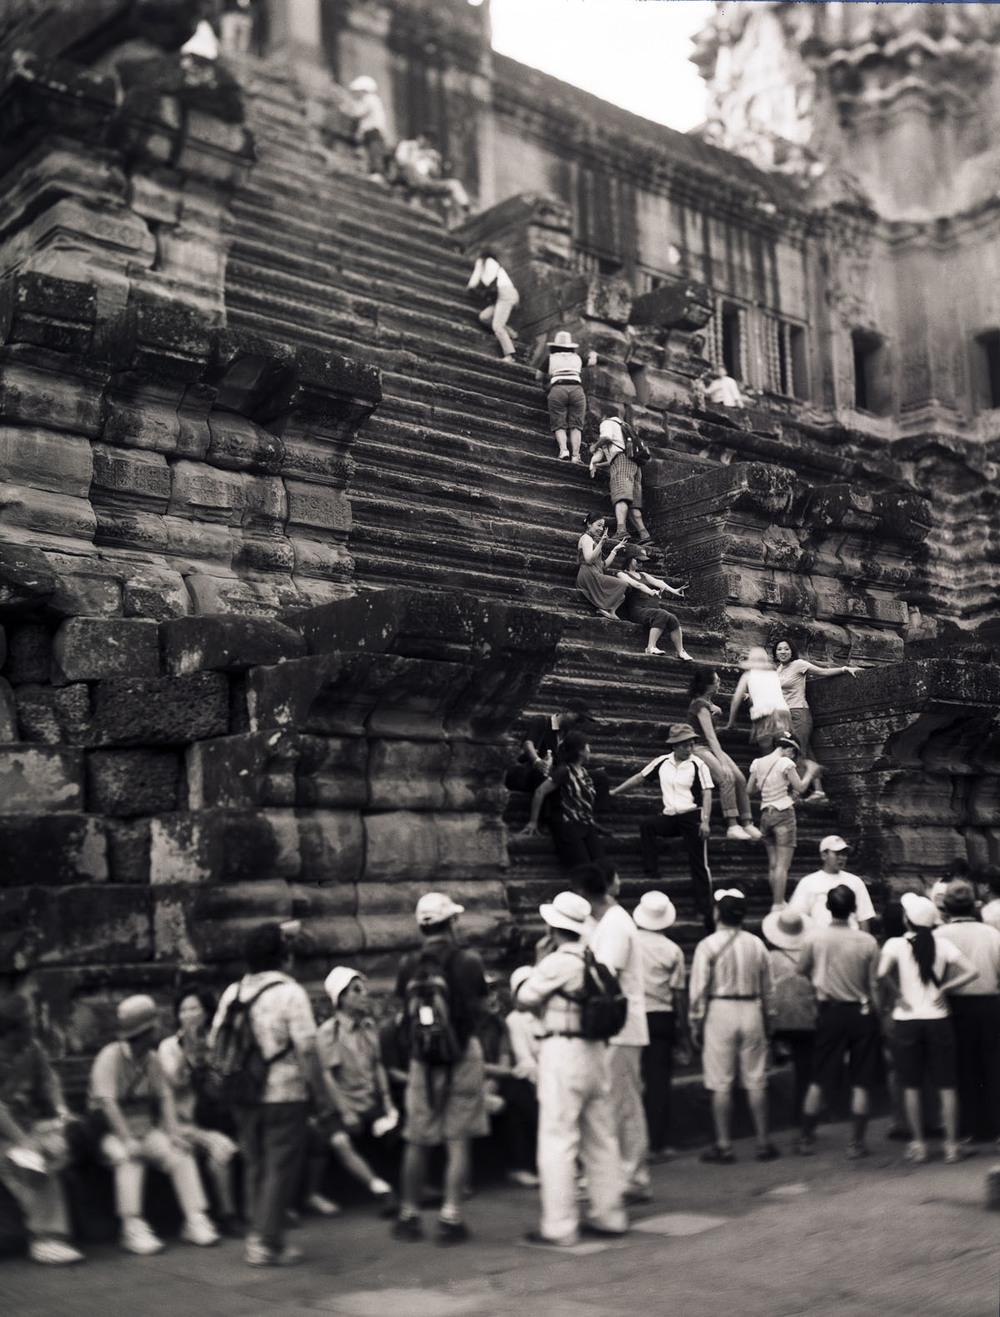 Angkor Wat Tourism